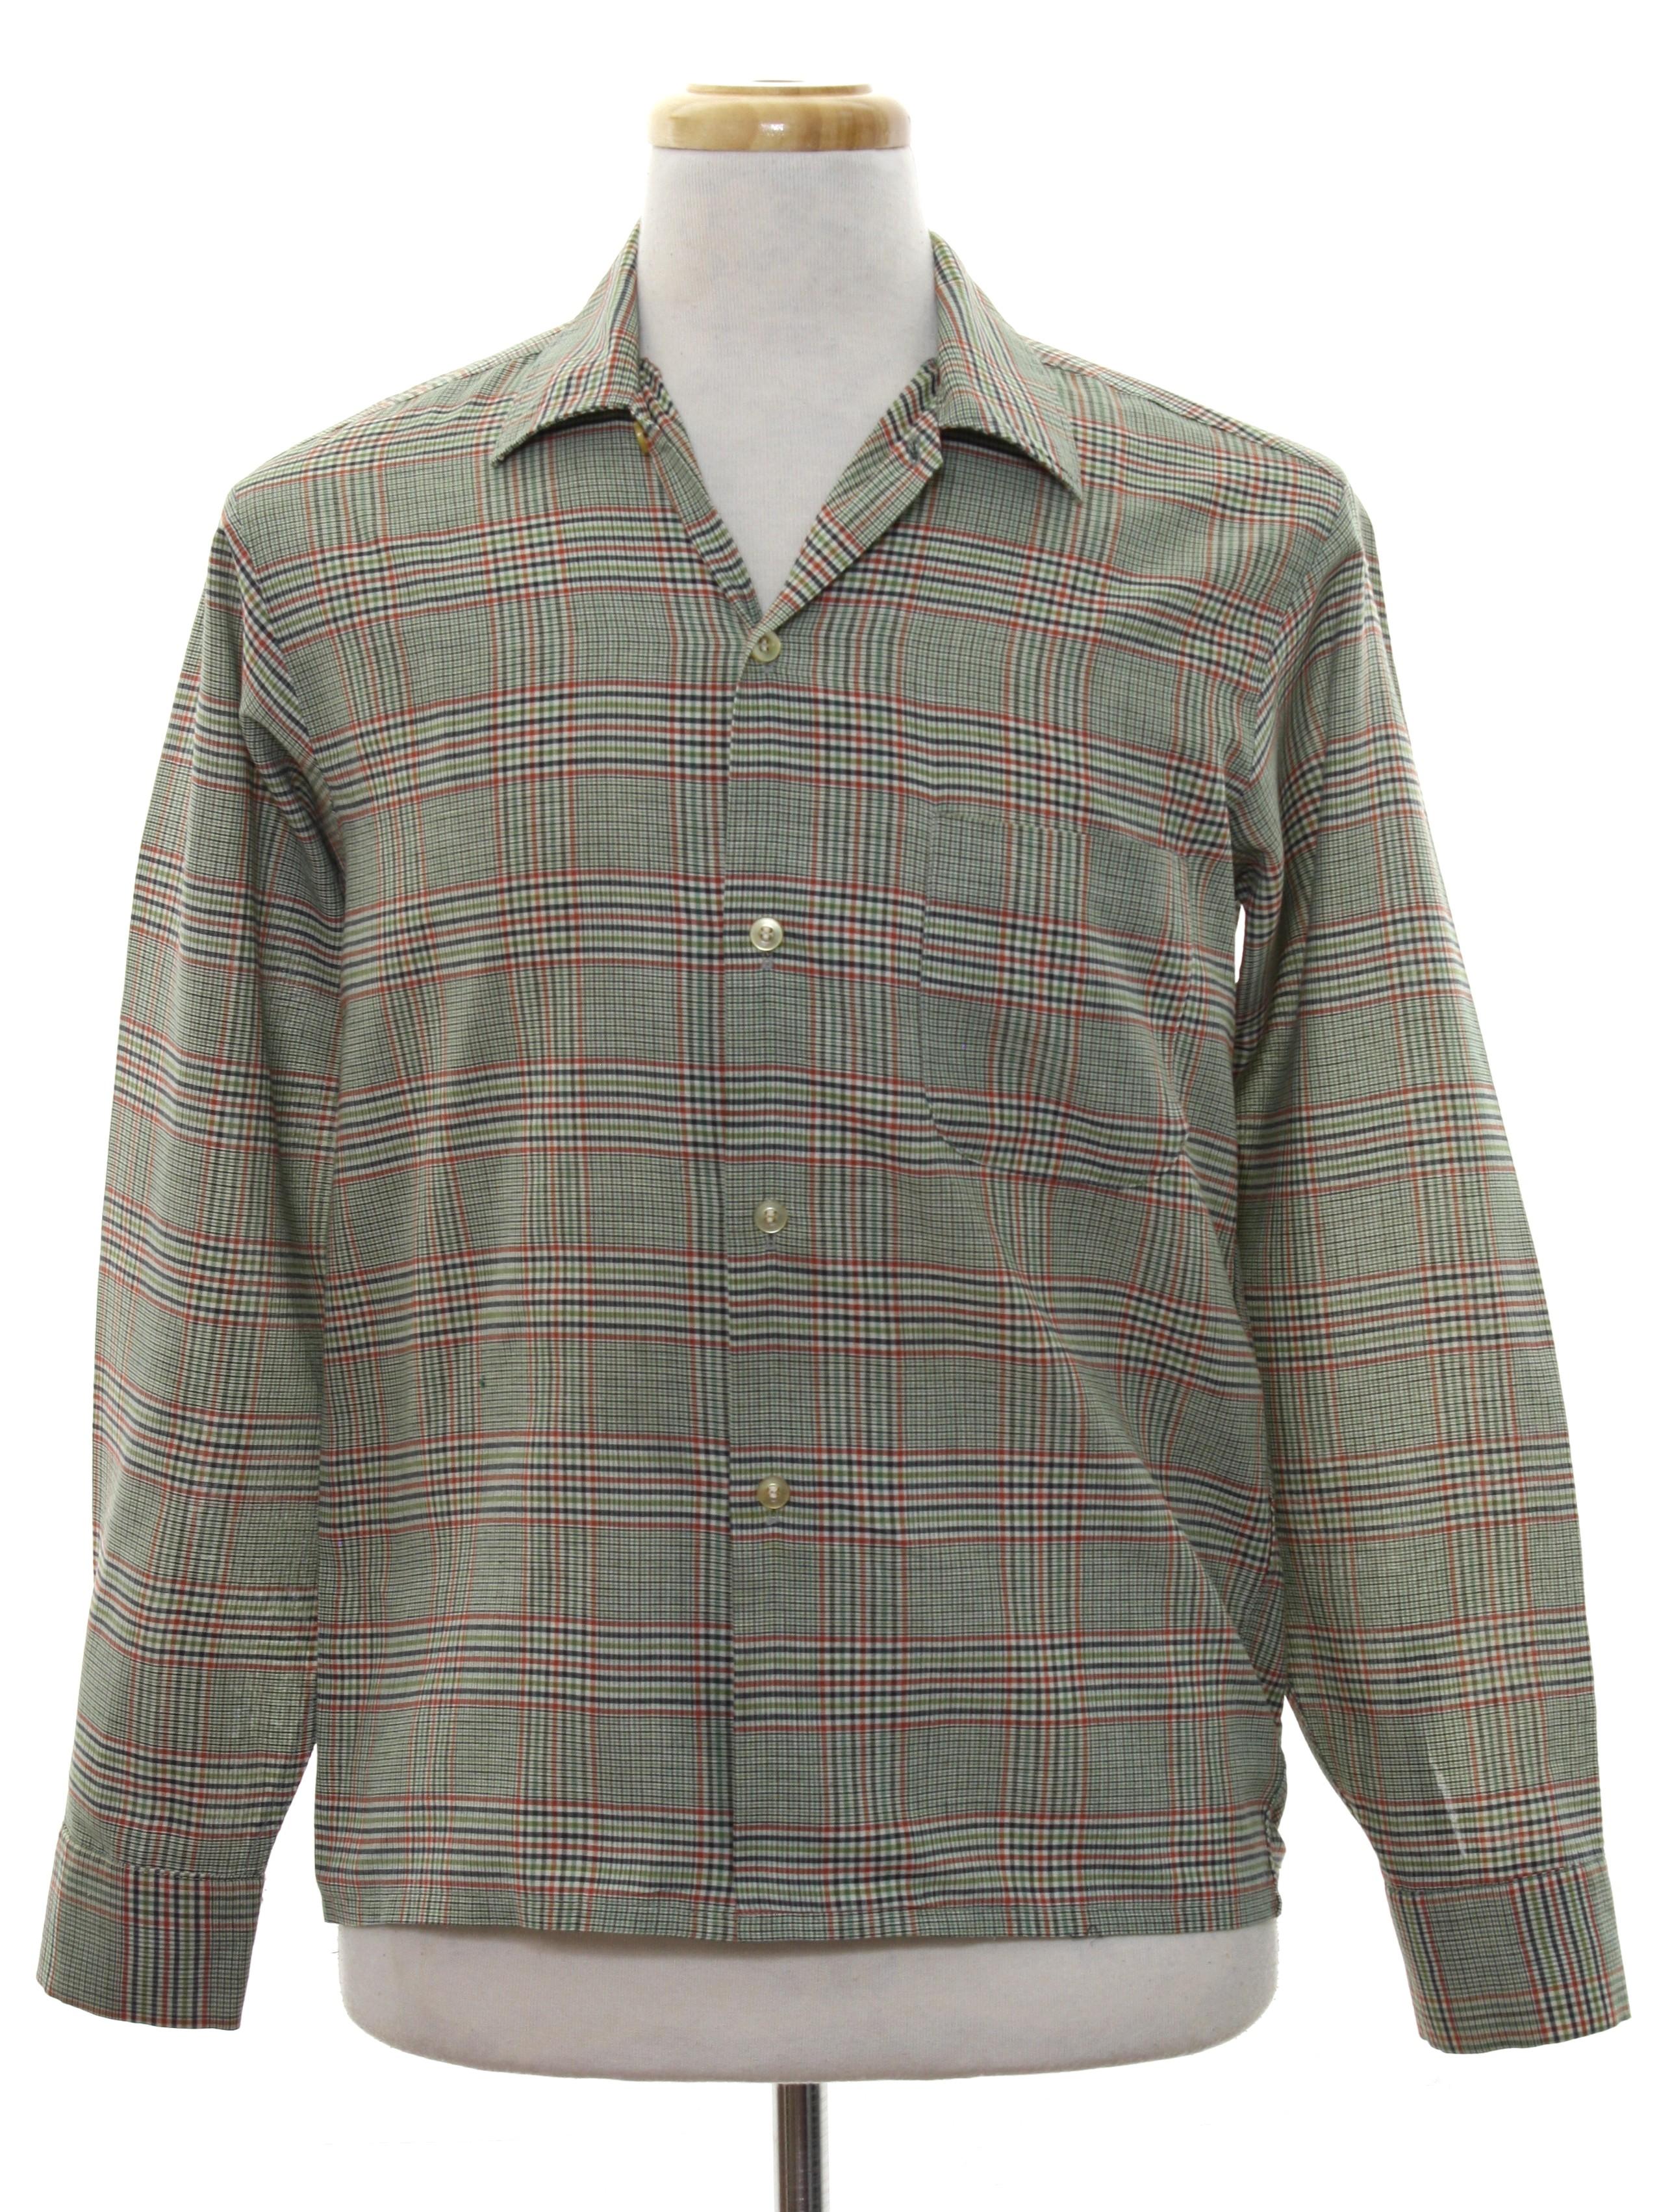 2a0c1ae5b9a1a 1960's Permanent Press Mens Mod Sport Shirt